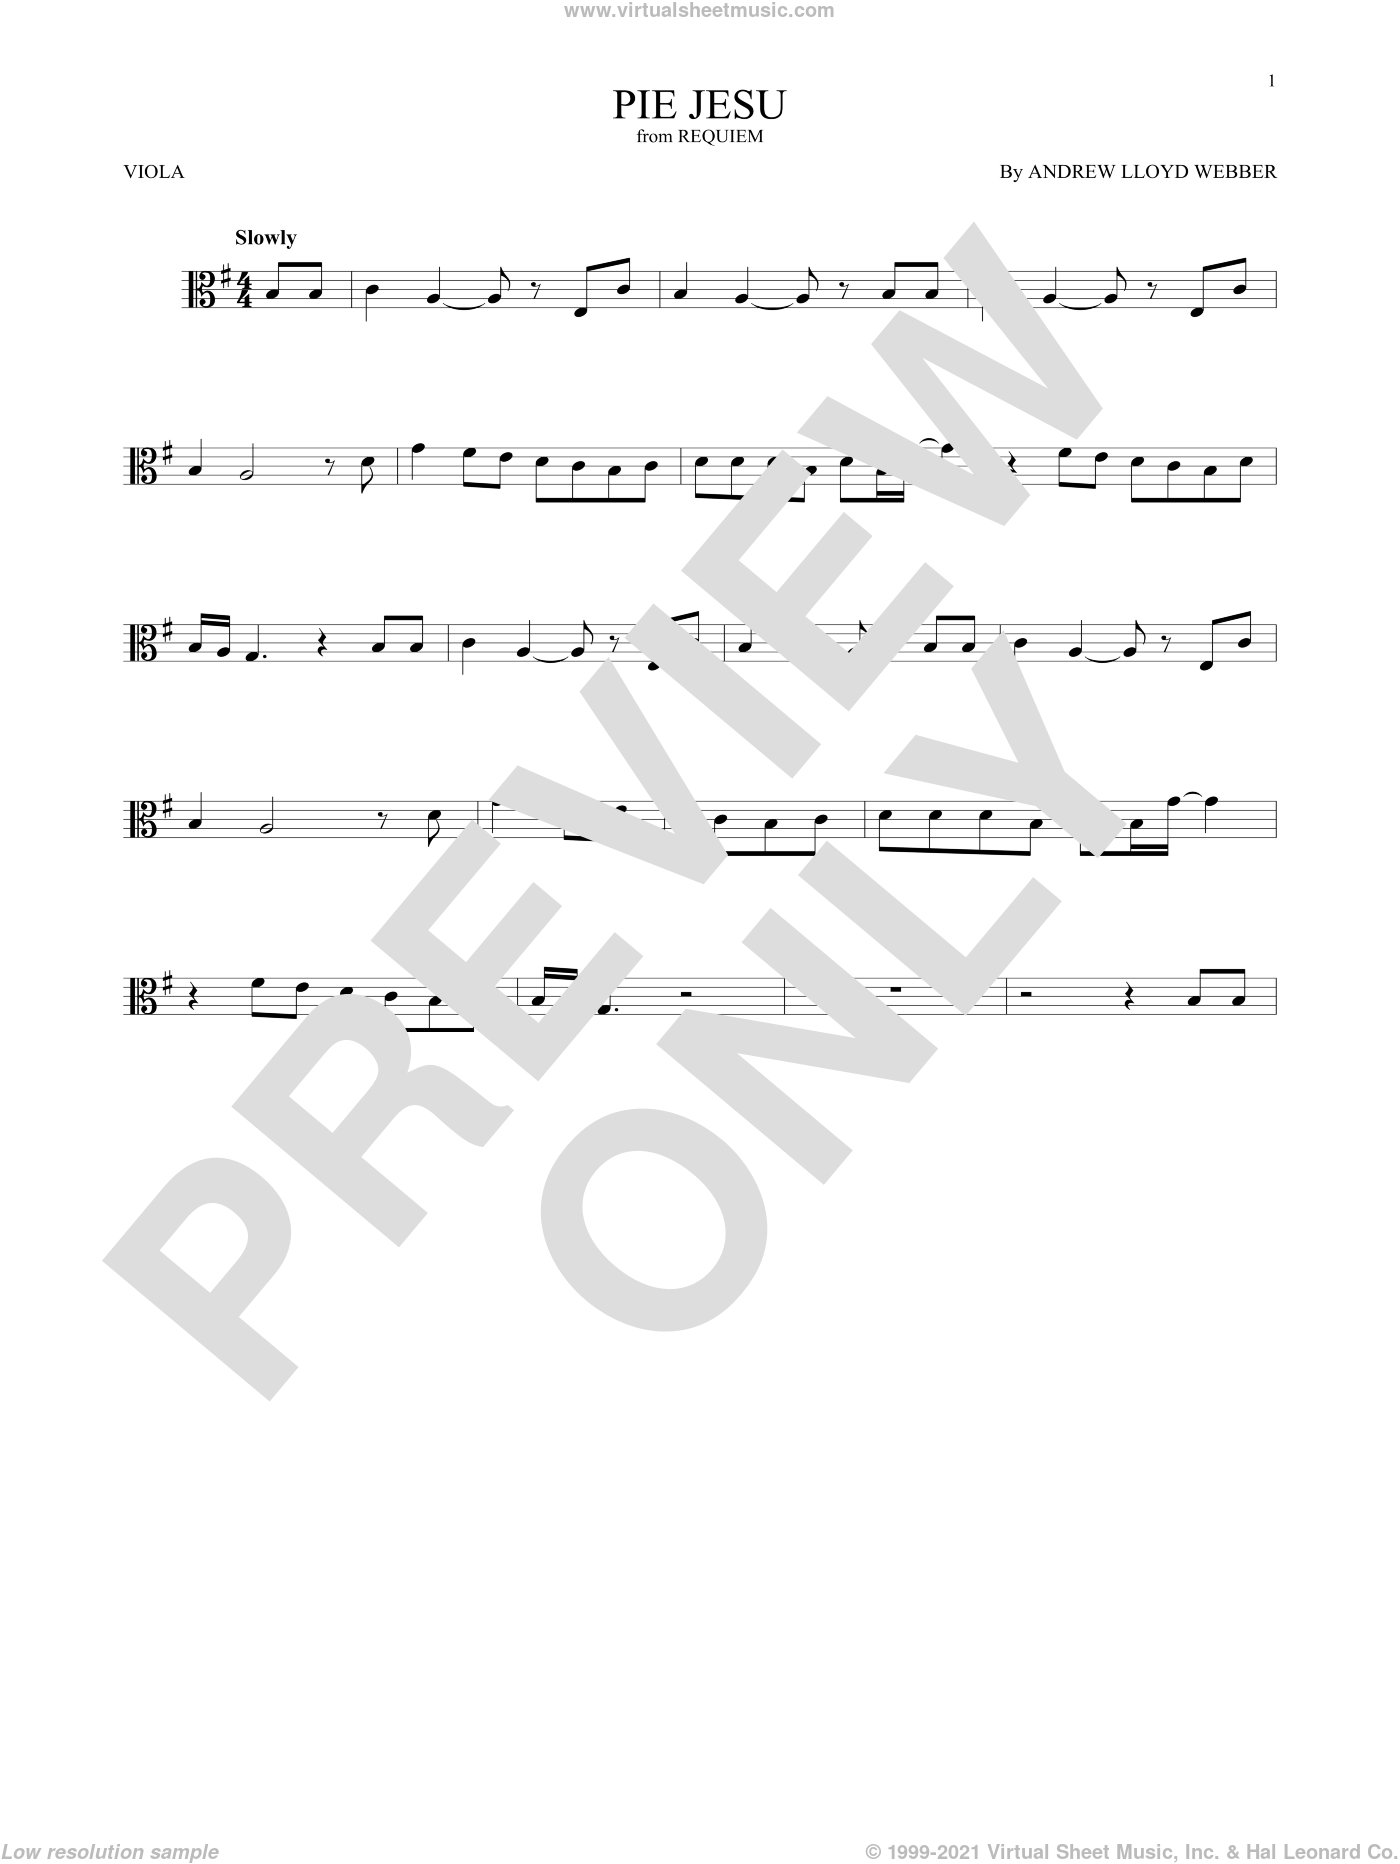 Pie Jesu (from Requiem) sheet music for viola solo by Andrew Lloyd Webber, intermediate skill level